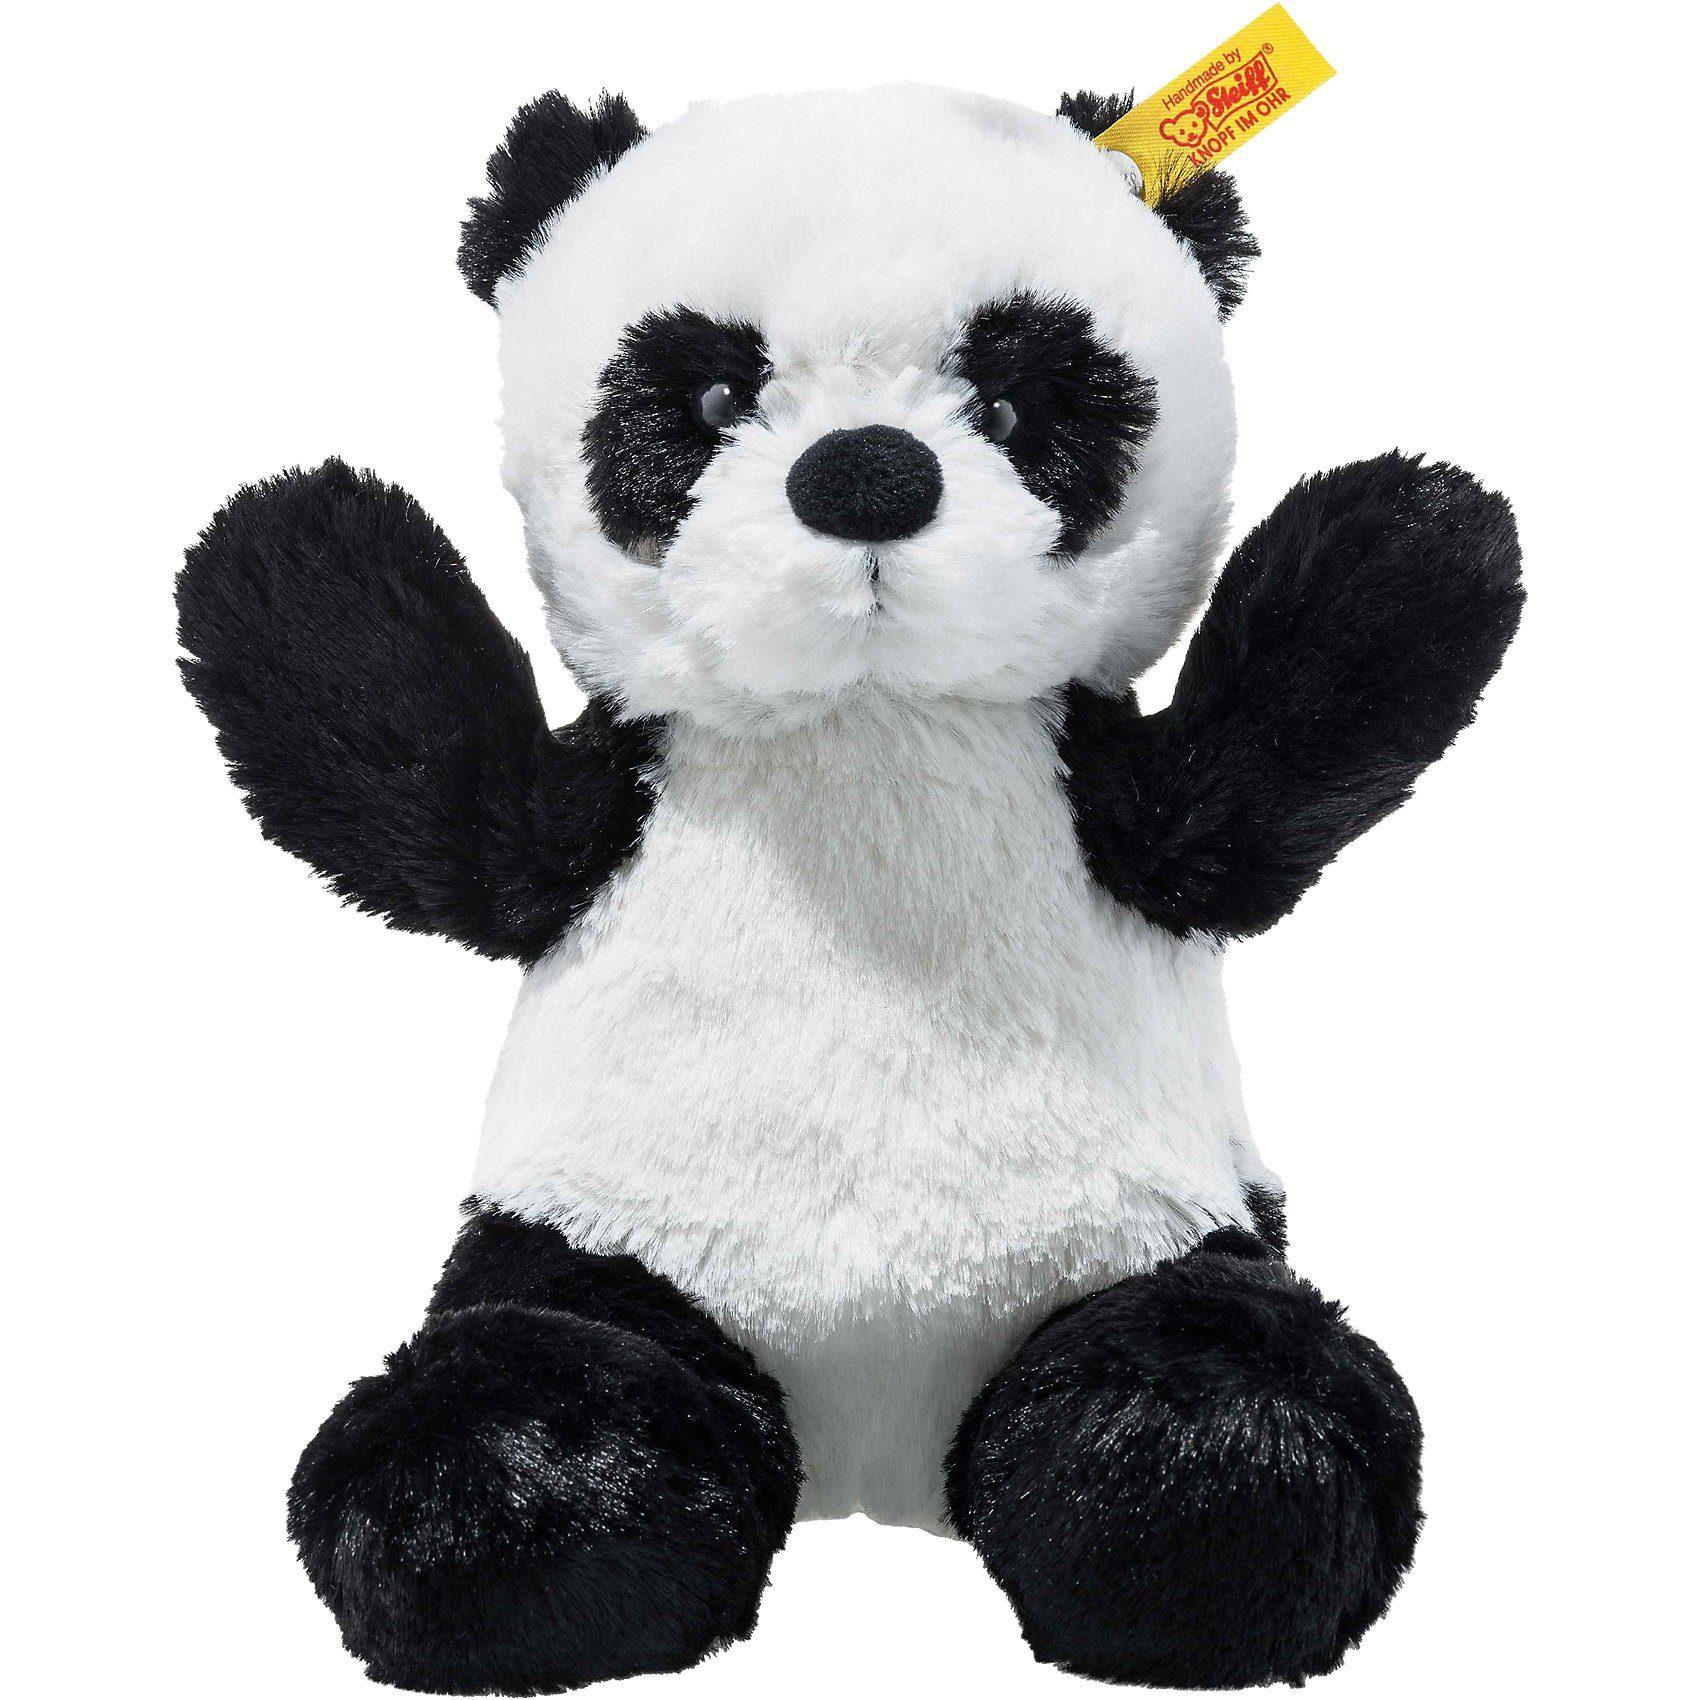 Steiff Soft Cuddly Friends Panda Ming weiss/schwarz, 18 cm